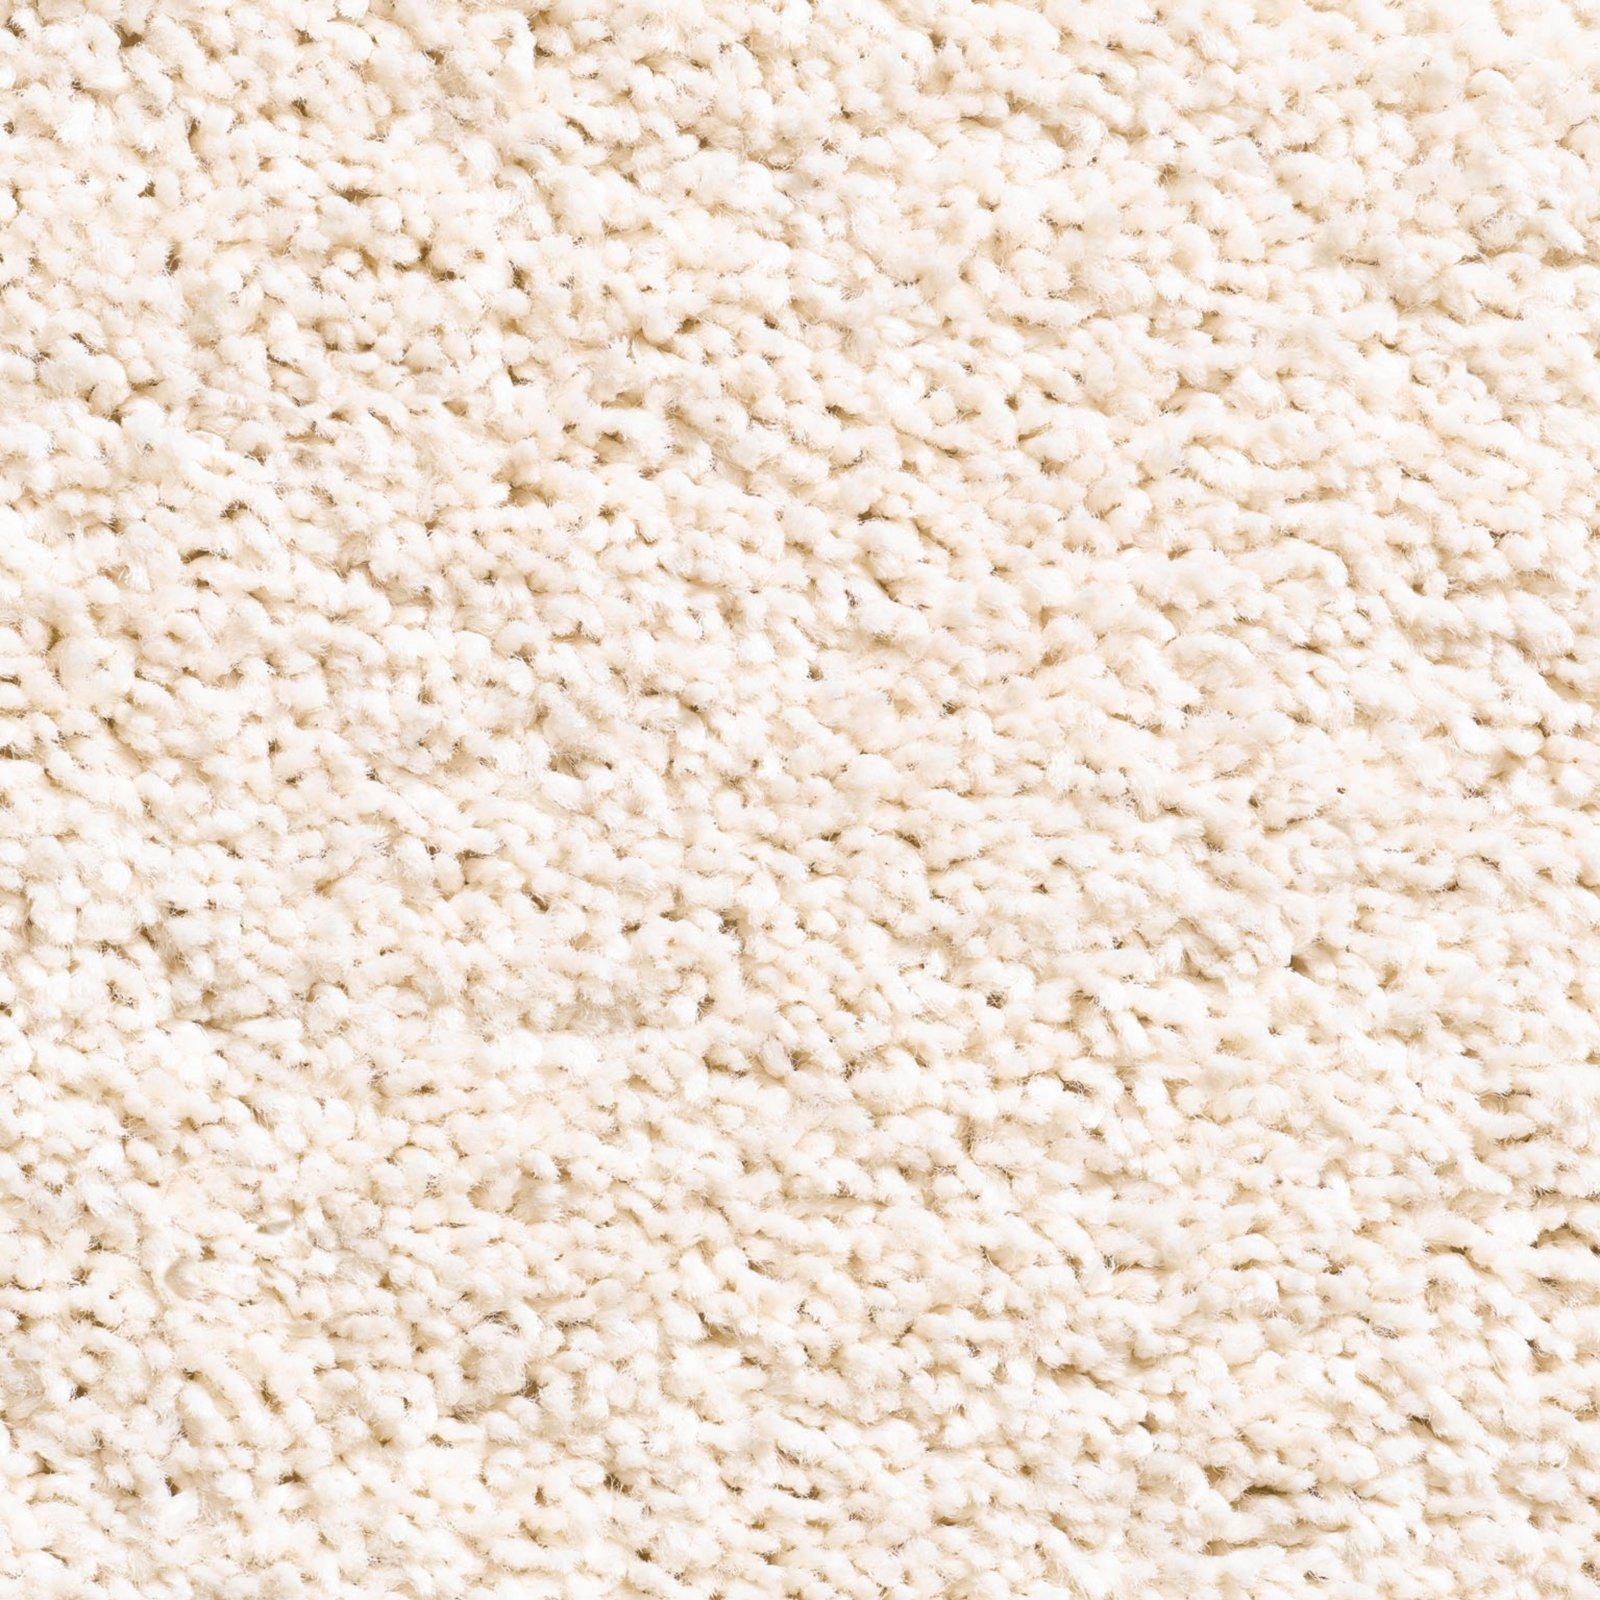 teppichboden bellini wei 5 meter breit teppichboden bodenbel ge baumarkt roller. Black Bedroom Furniture Sets. Home Design Ideas